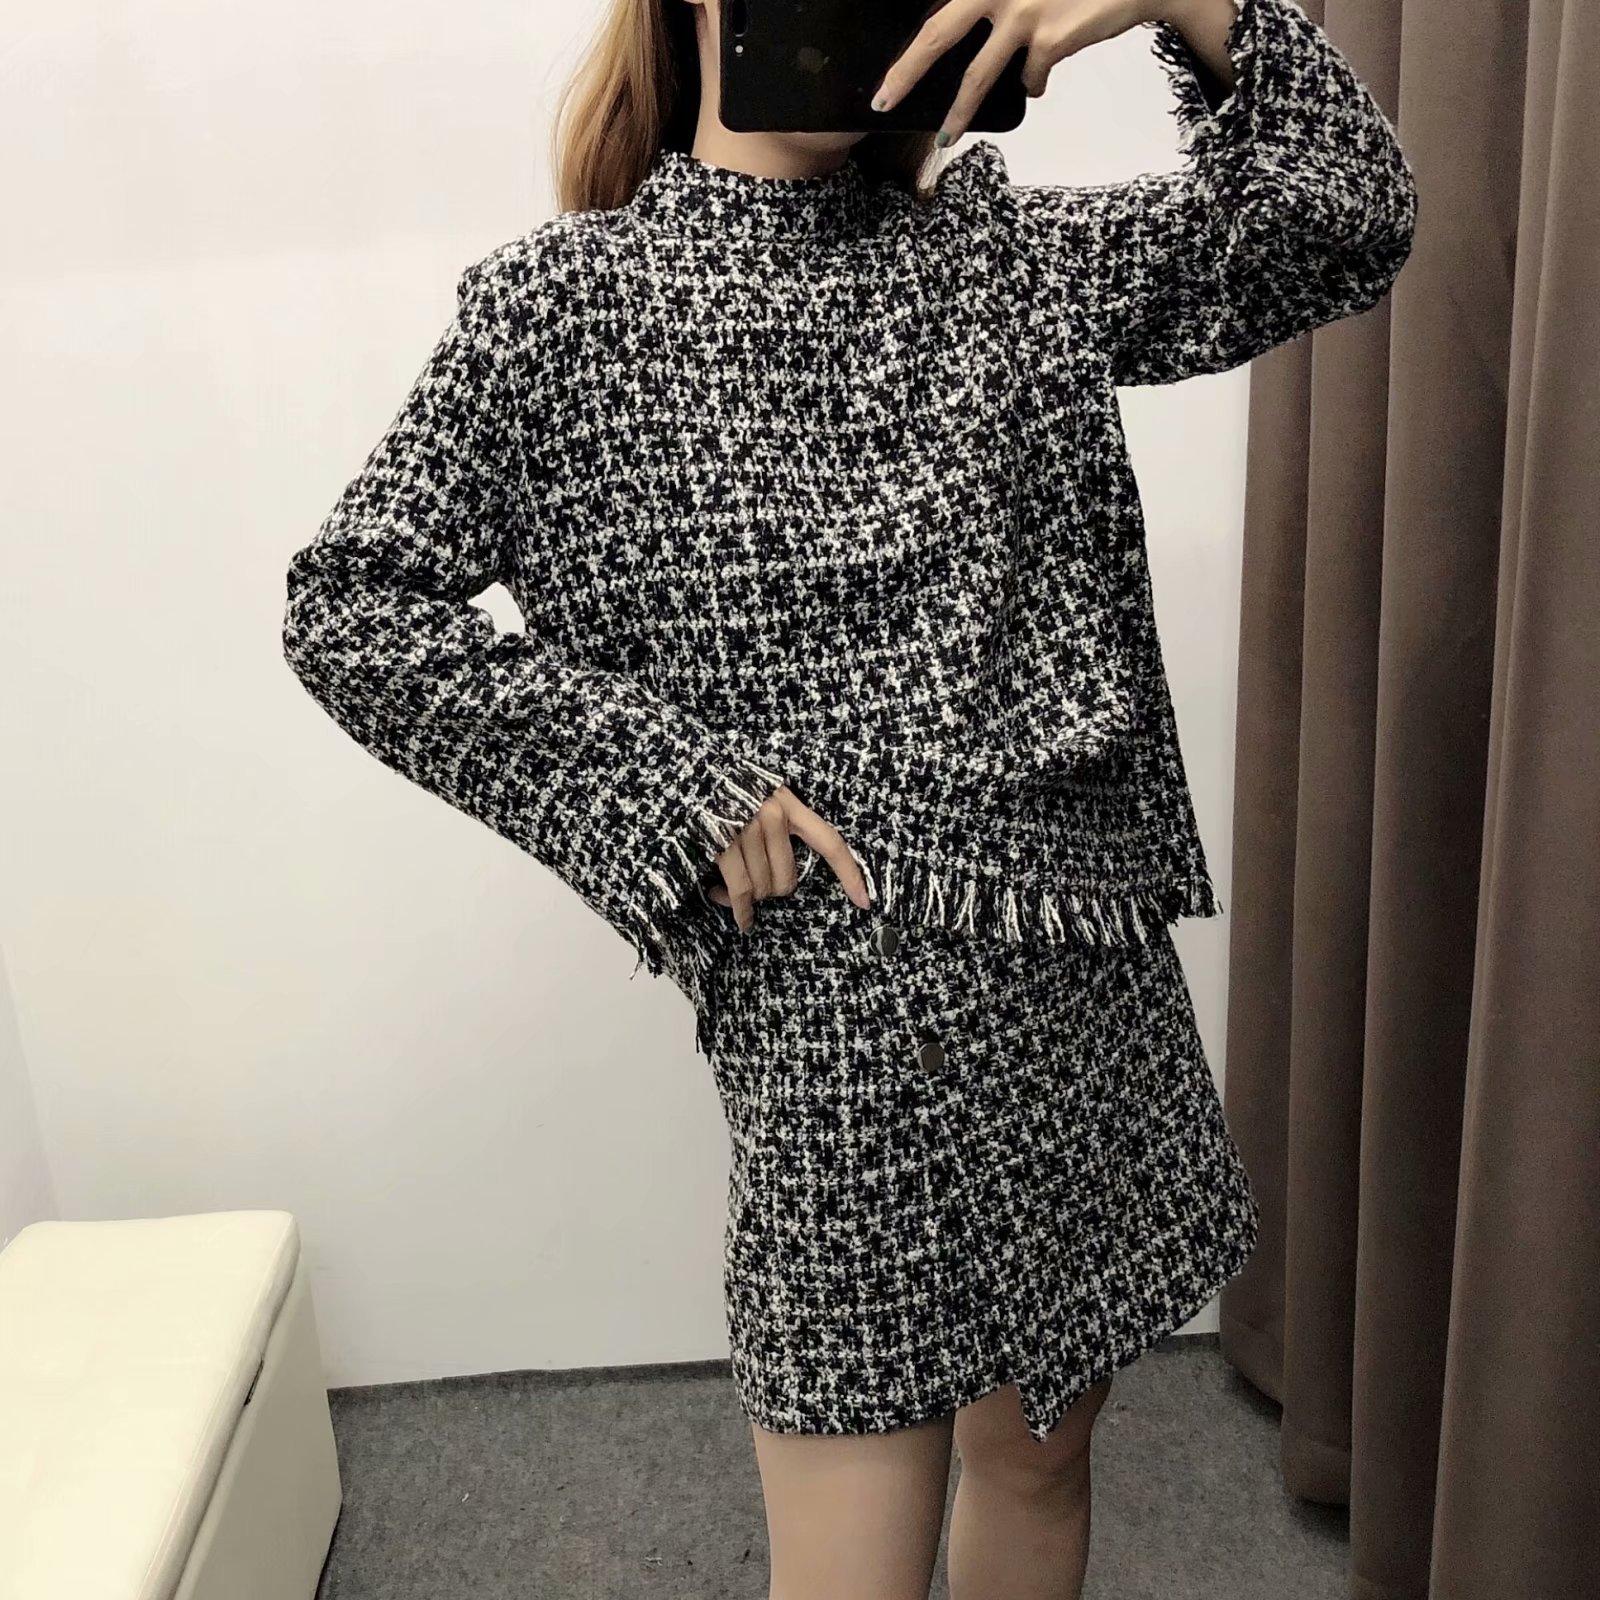 Single WOMEN'S Dress Autumn New Style Europe And America Versitile Fashion Retro Graceful Tweed Casual Short Skirts